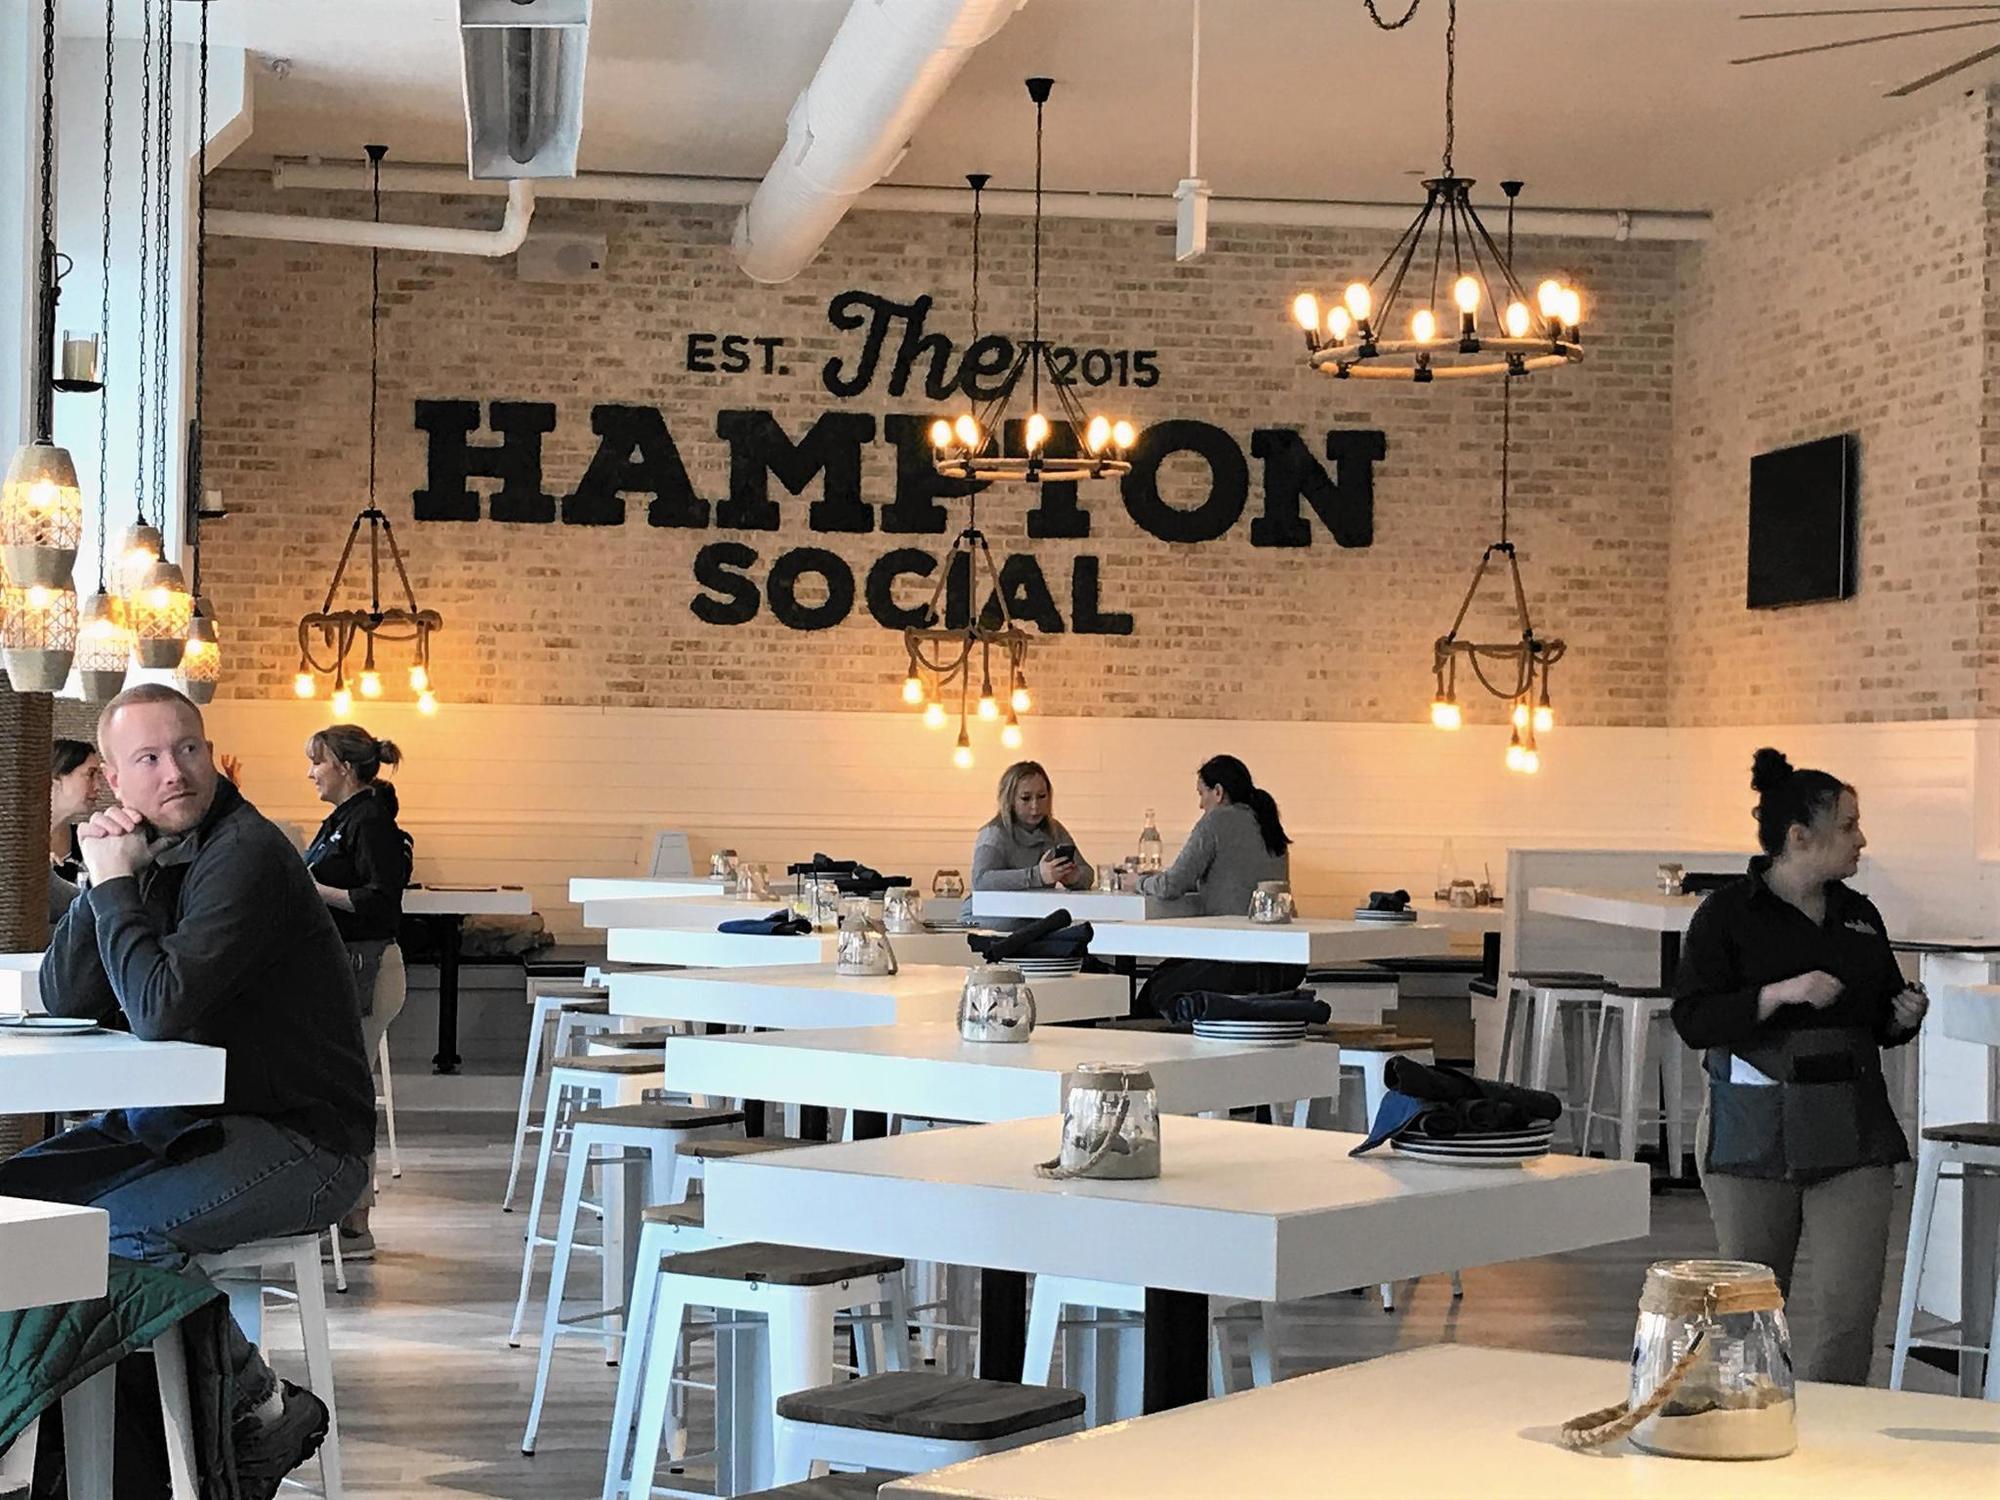 Chicago S The Hampton Social Restaurant Coming To I Drive Pointe Orlando Sentinel